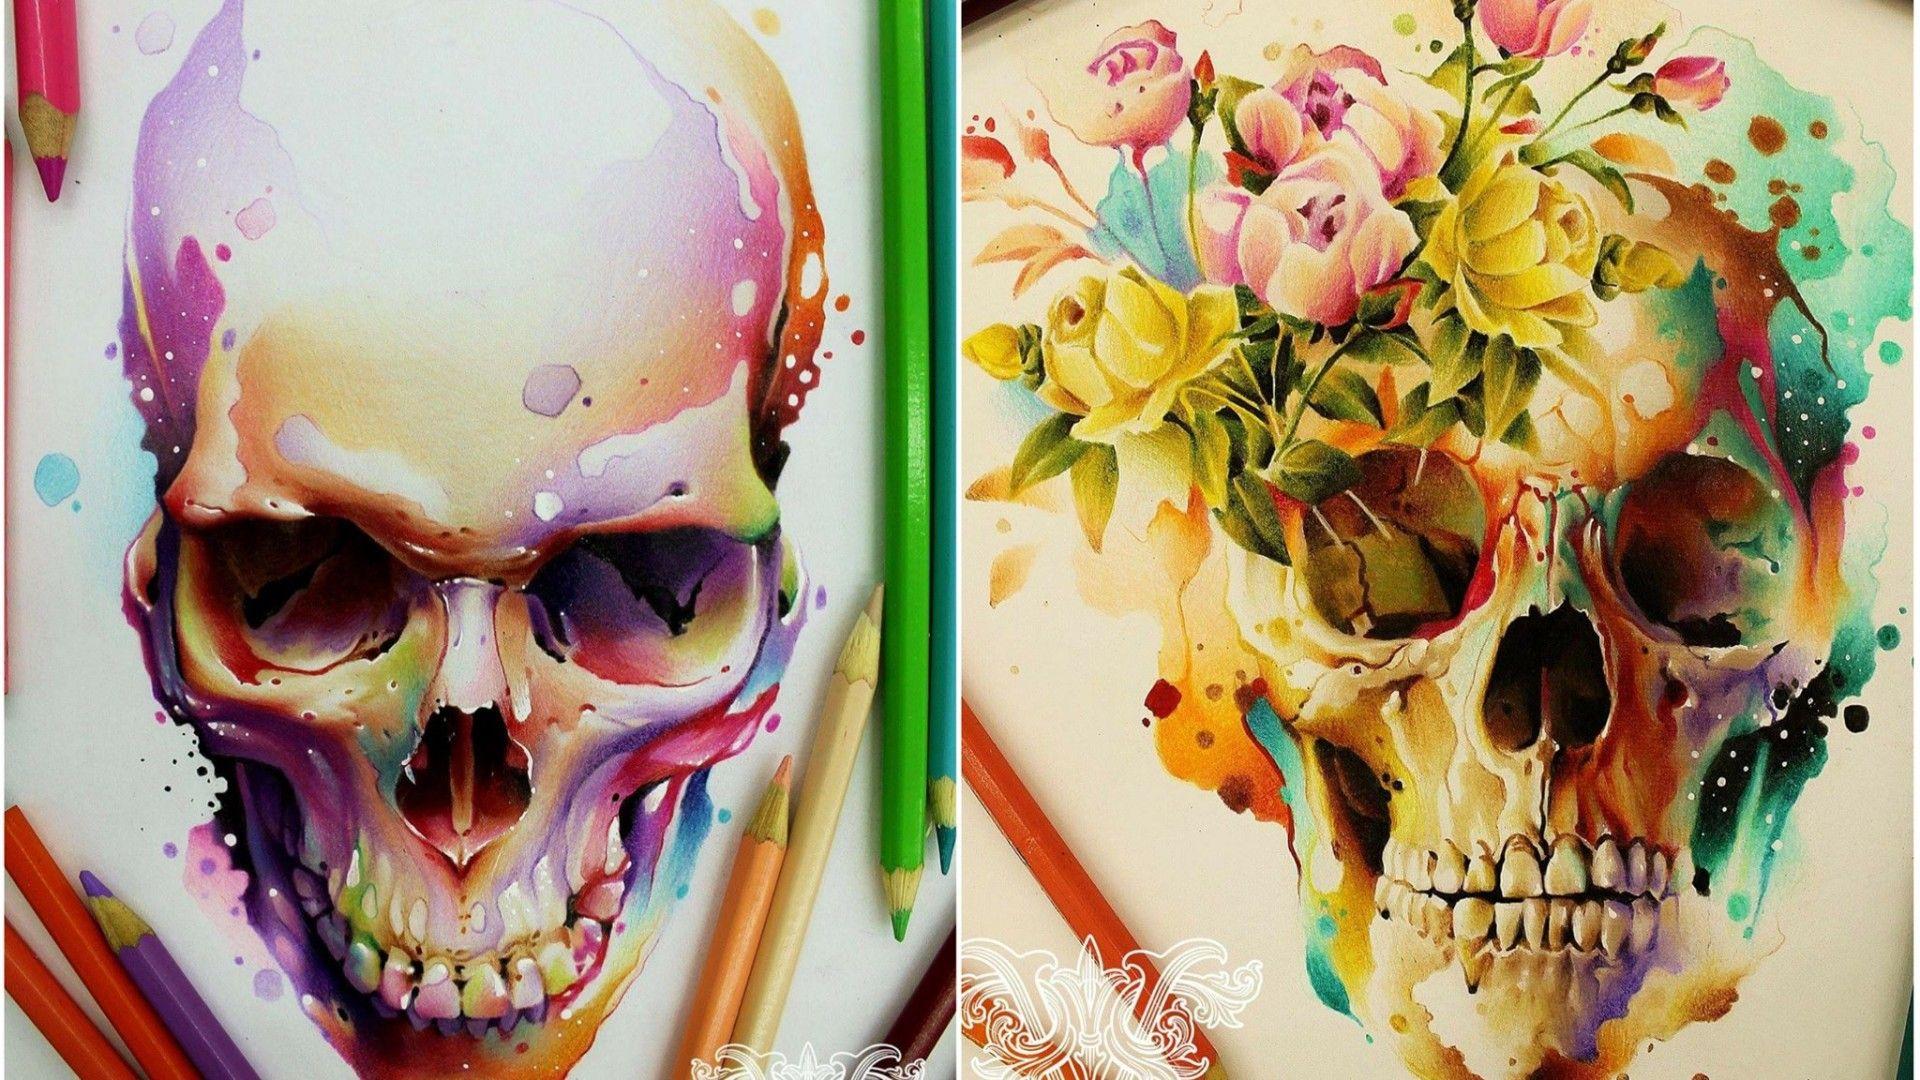 As Ilustracoes Do Artista Vareta Artistas Ilustracao Tattoo